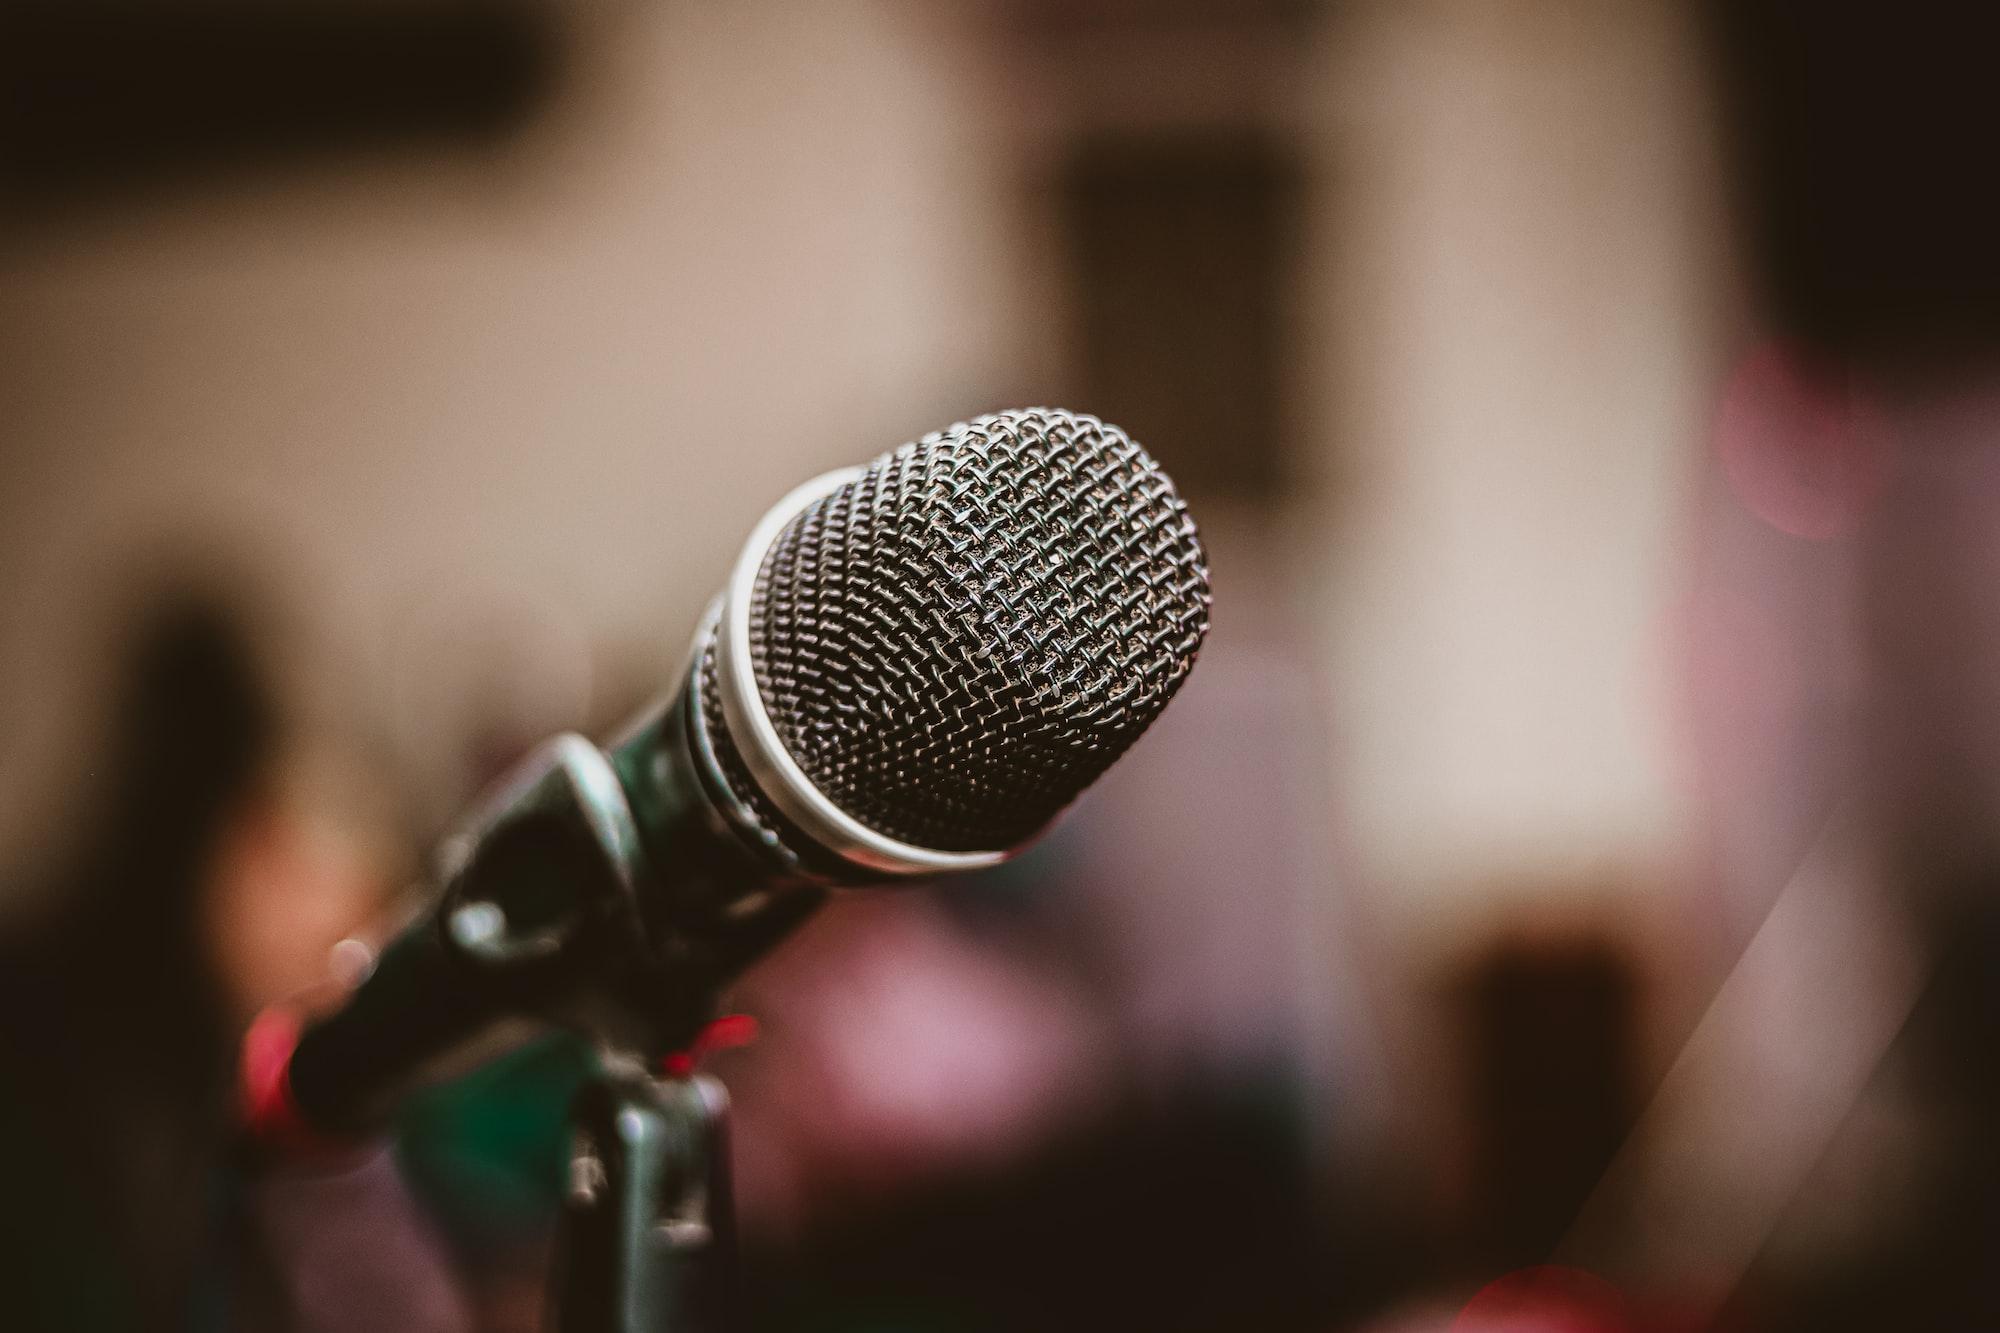 TikTok: Voiceover